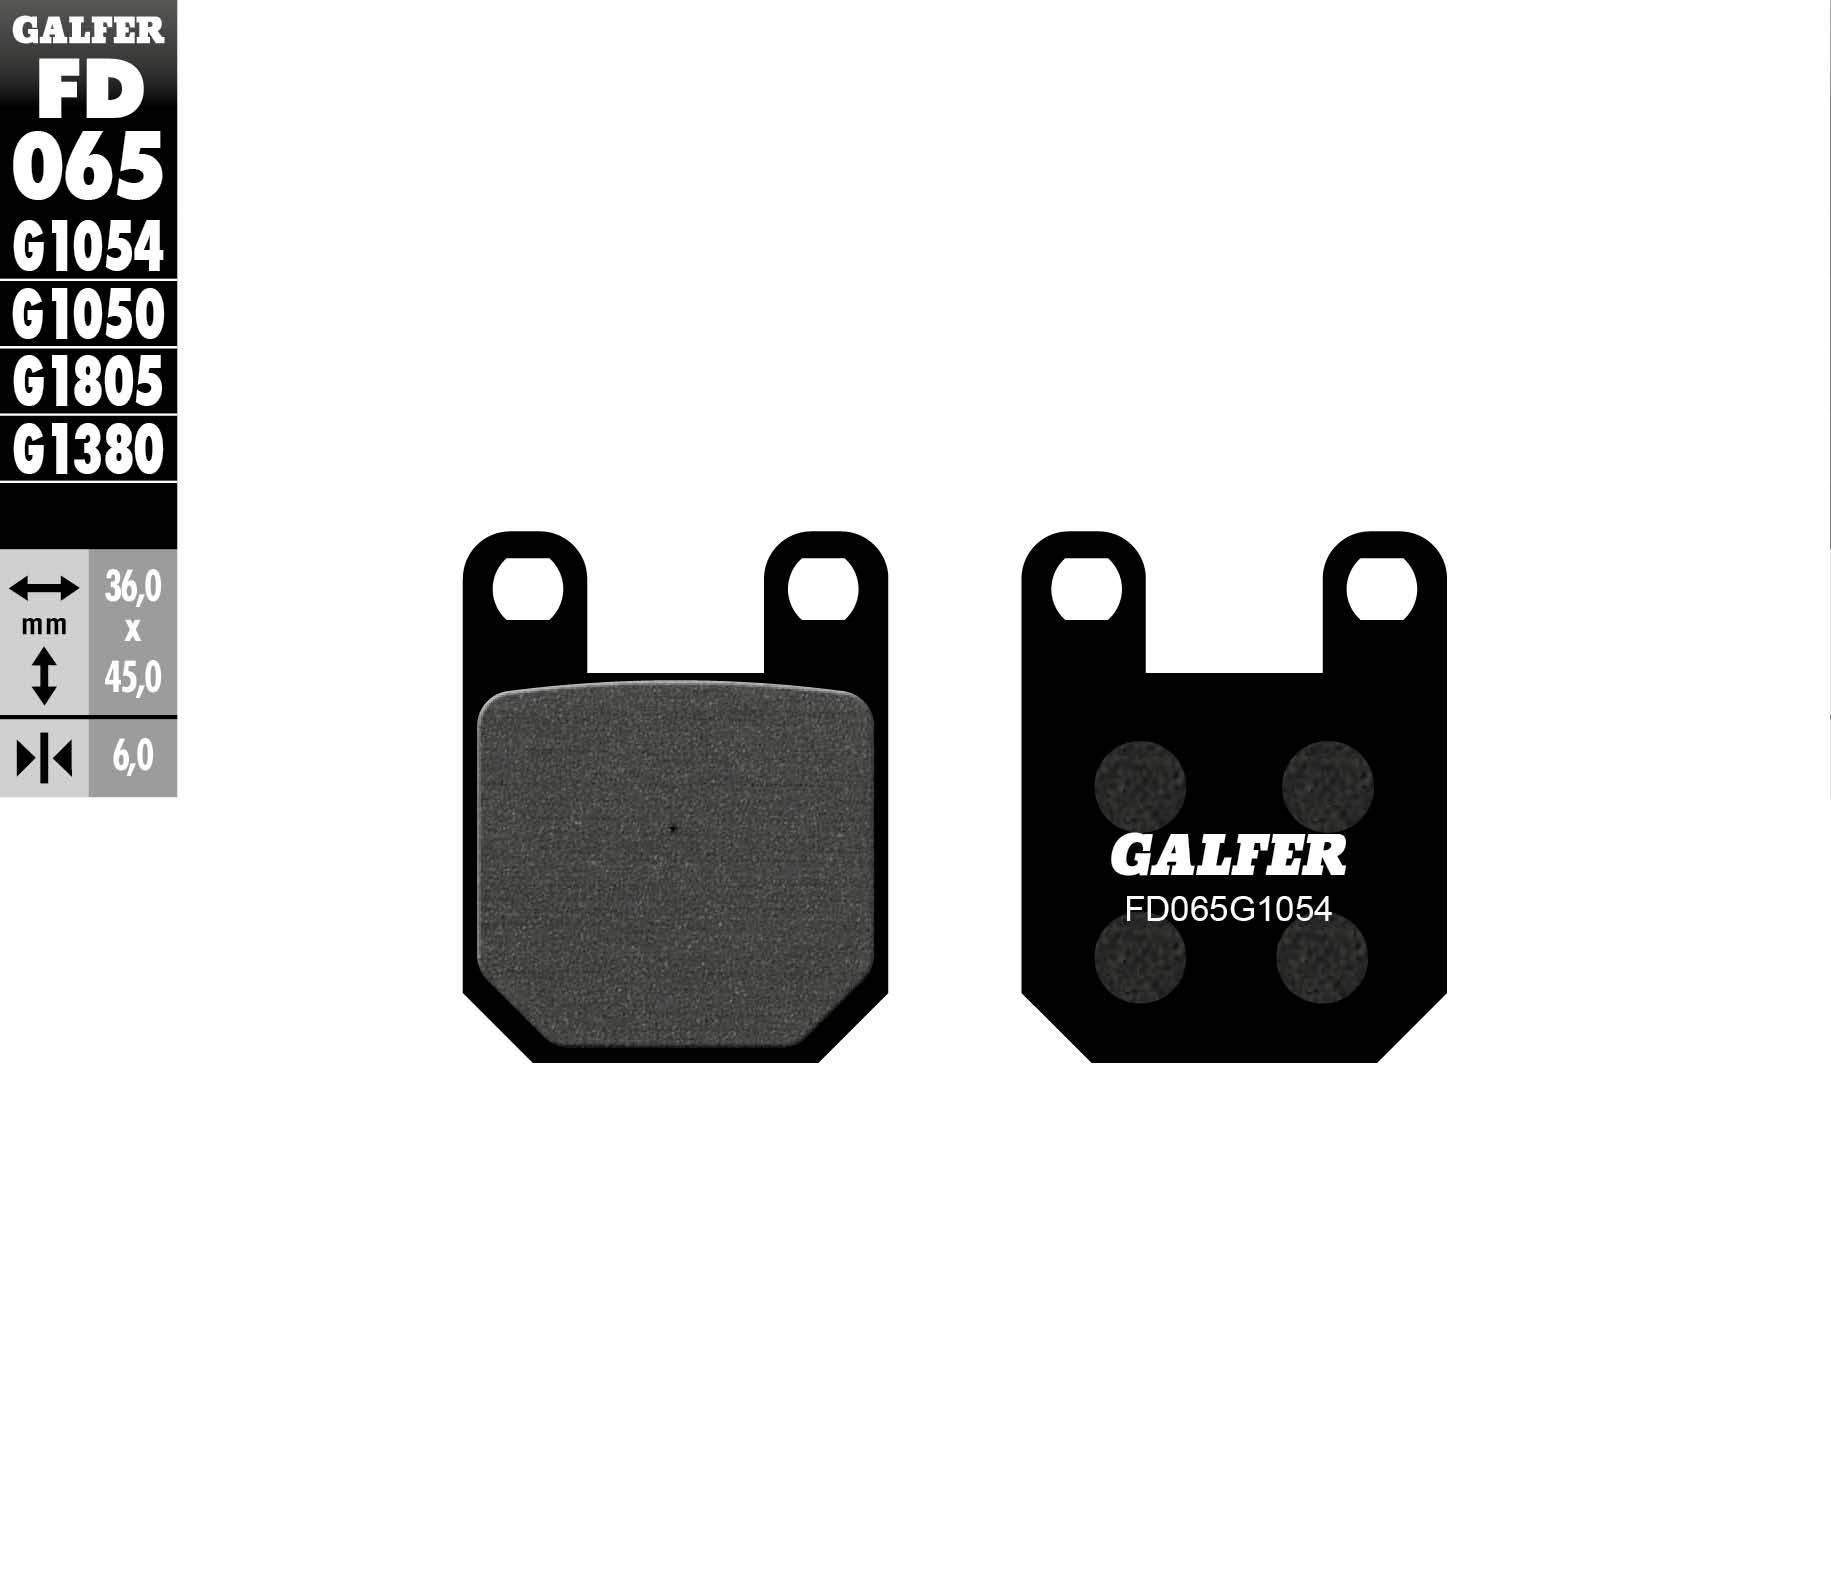 GALFER PLAQUETTES FREINS ARRIERE PEUGEOT LOOXOR 2002 FD065